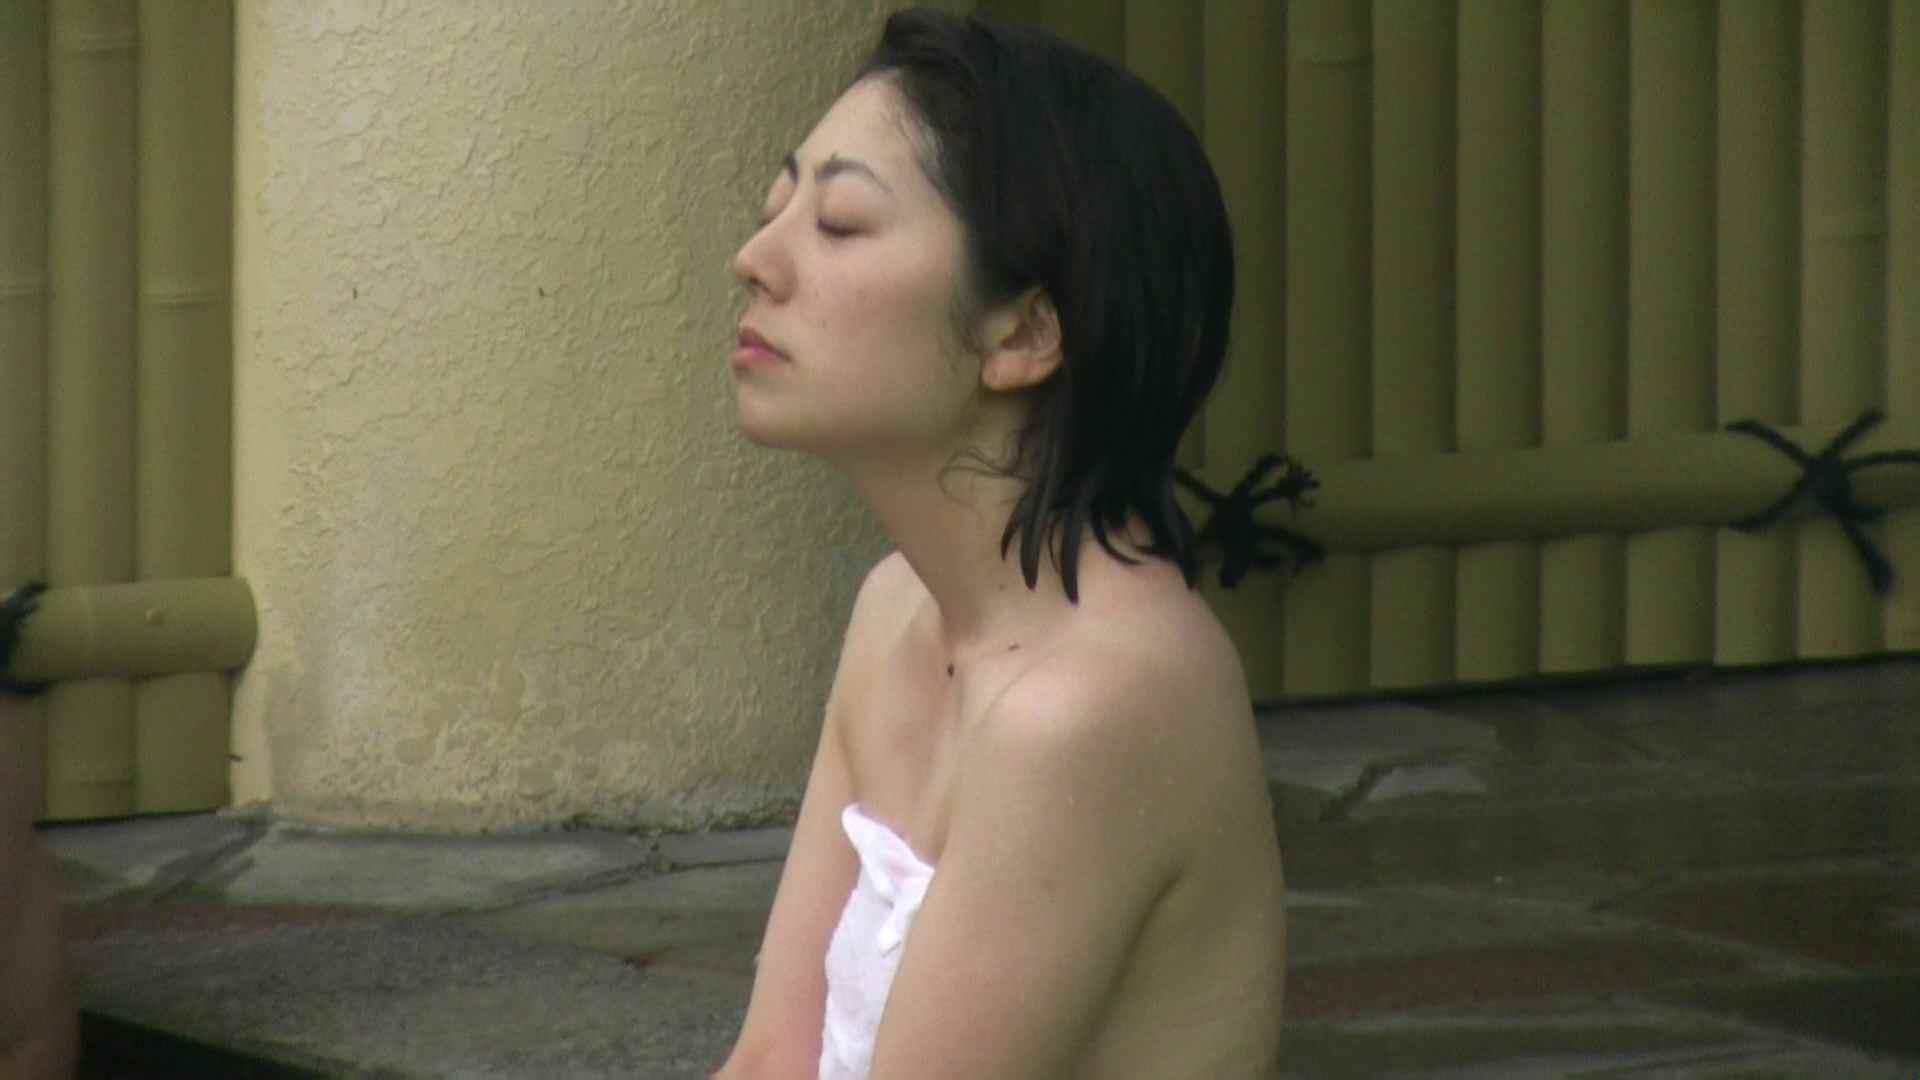 Aquaな露天風呂Vol.04 露天風呂編  94PIX 38